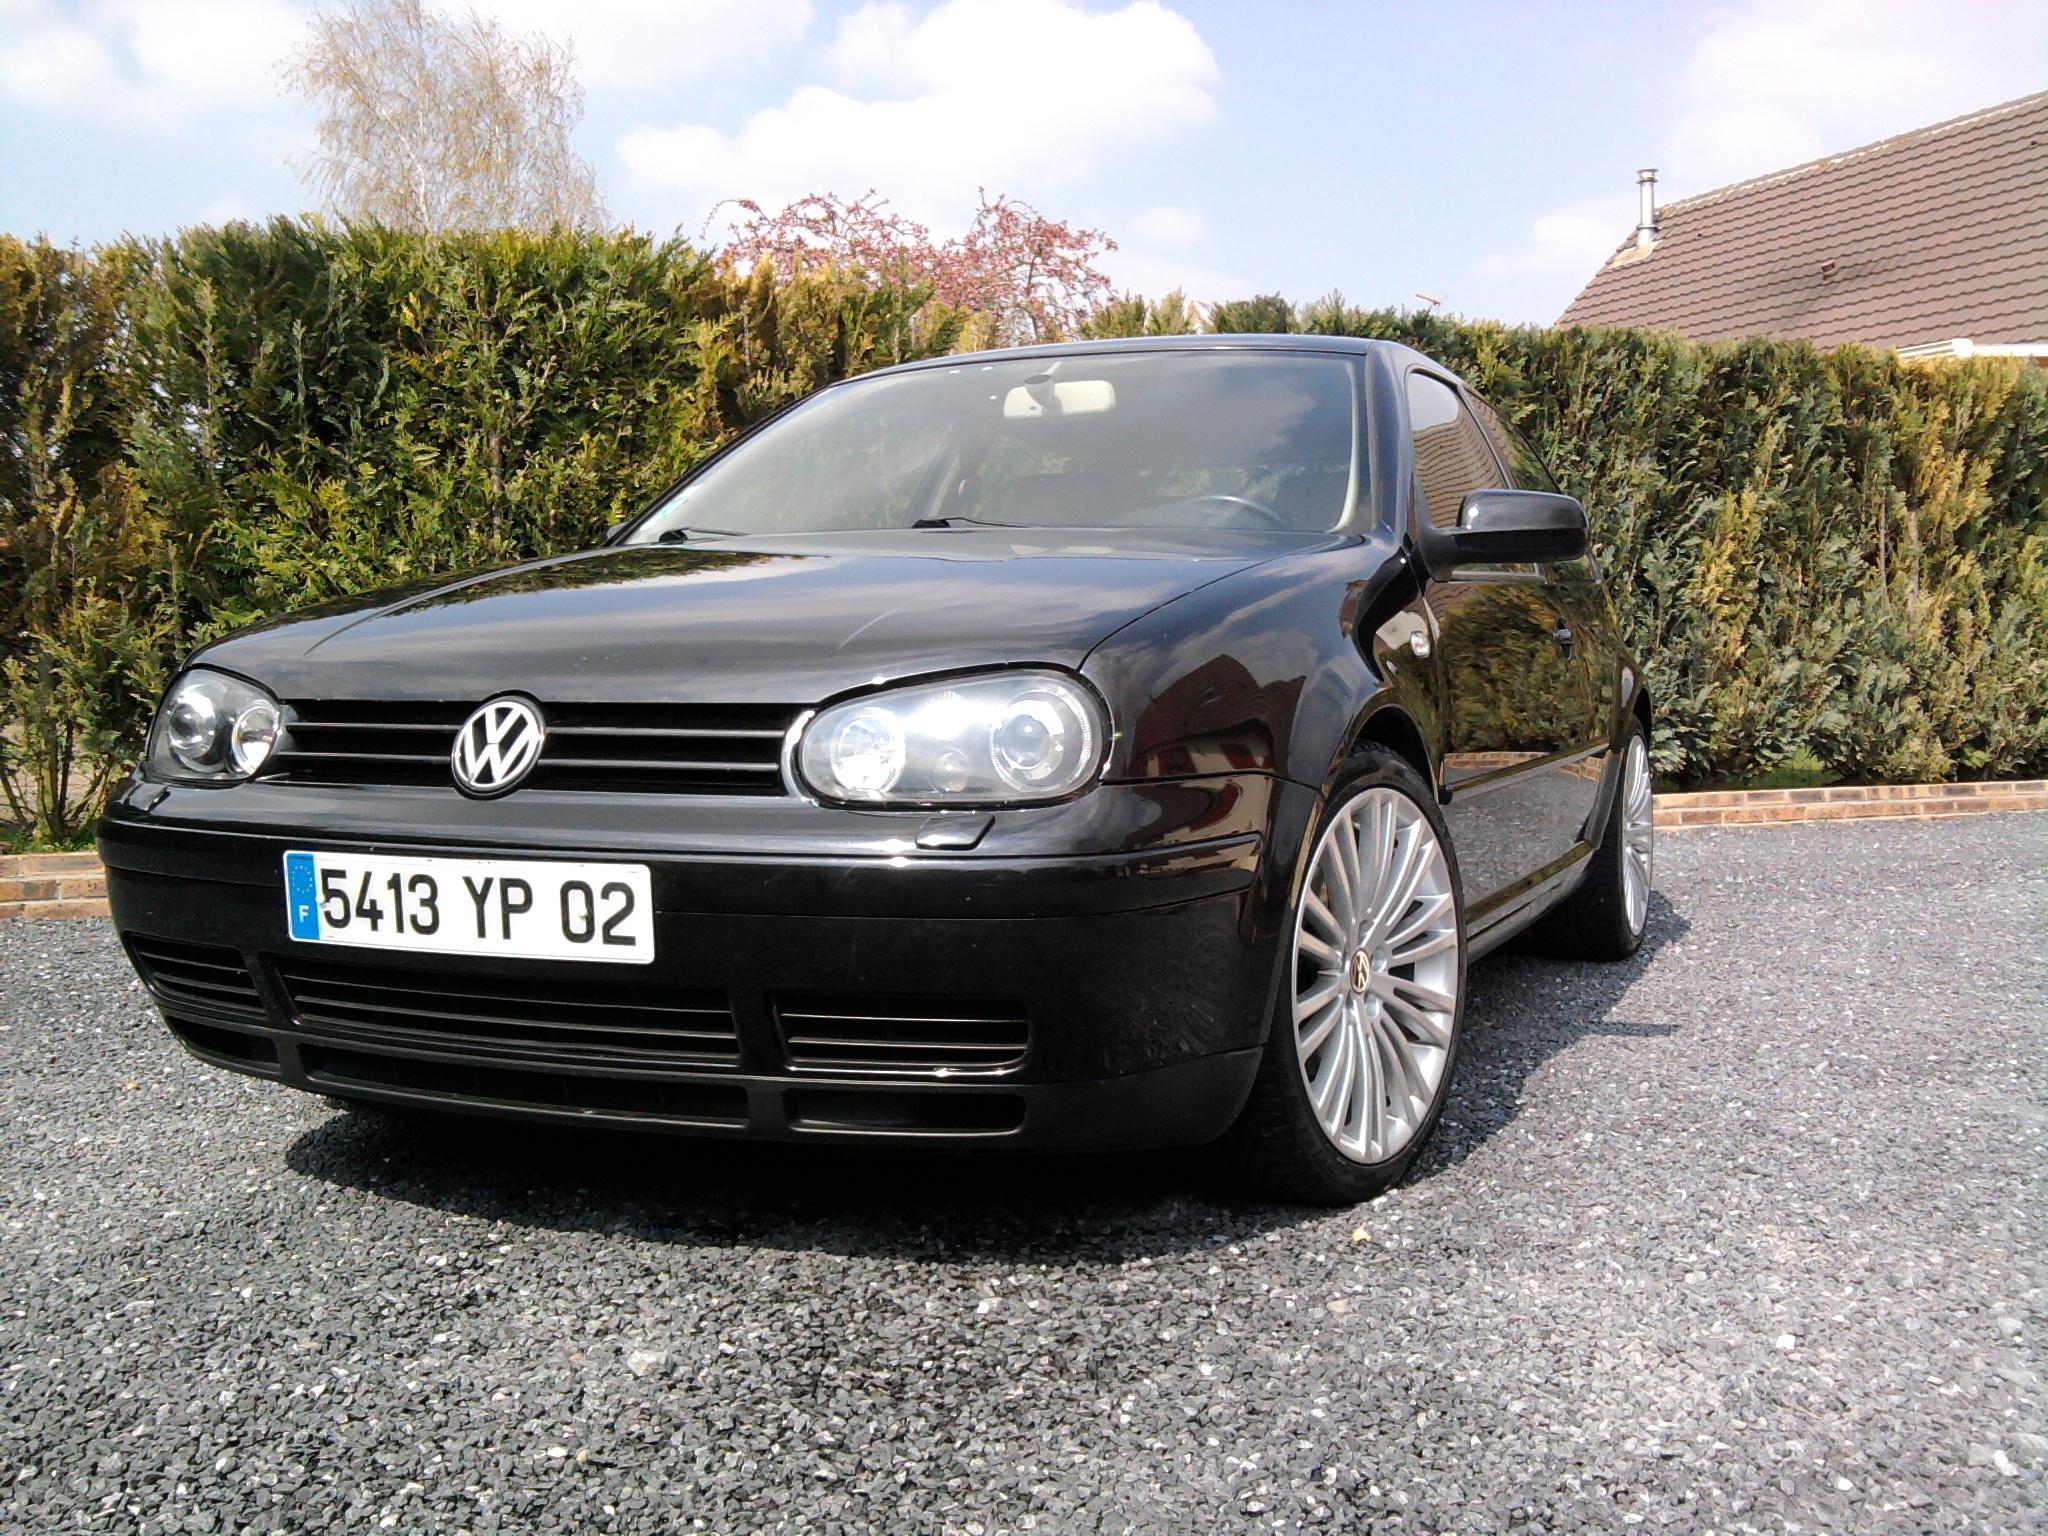 Golf tdi 150 4motion de s one02 pr paration garage for Garage volkswagen le chesnay 78